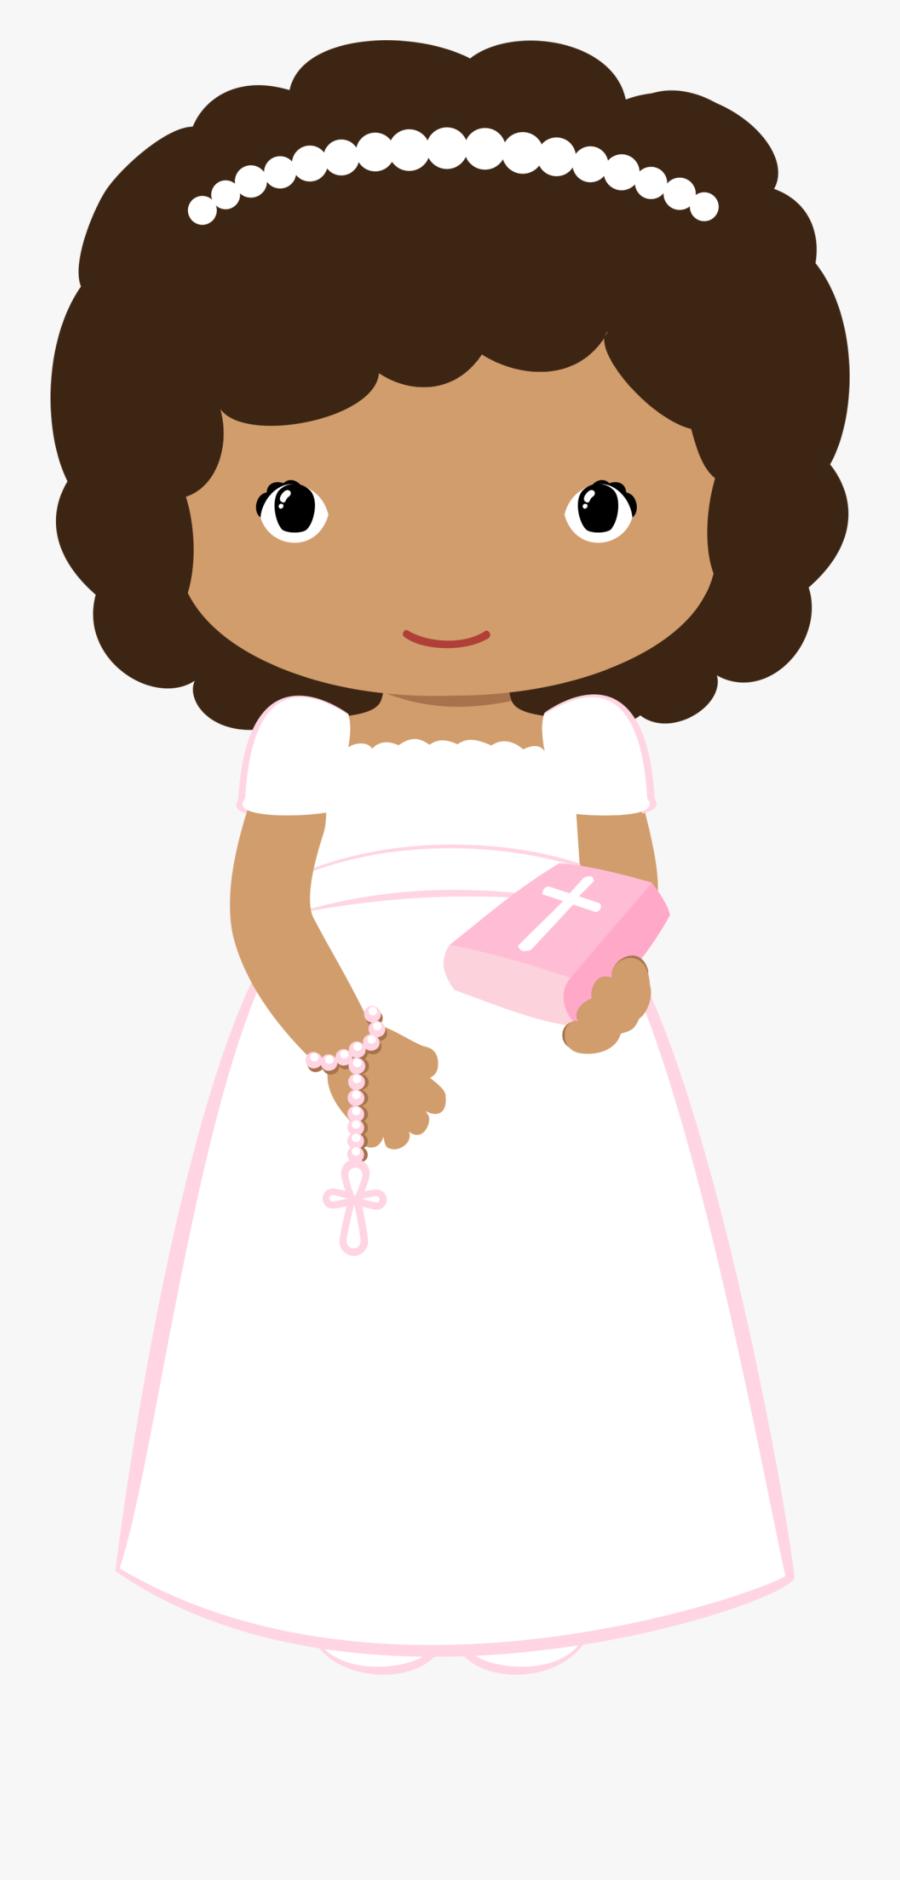 Girl Clipart First Communion - Communion Girl Clipart, Transparent Clipart